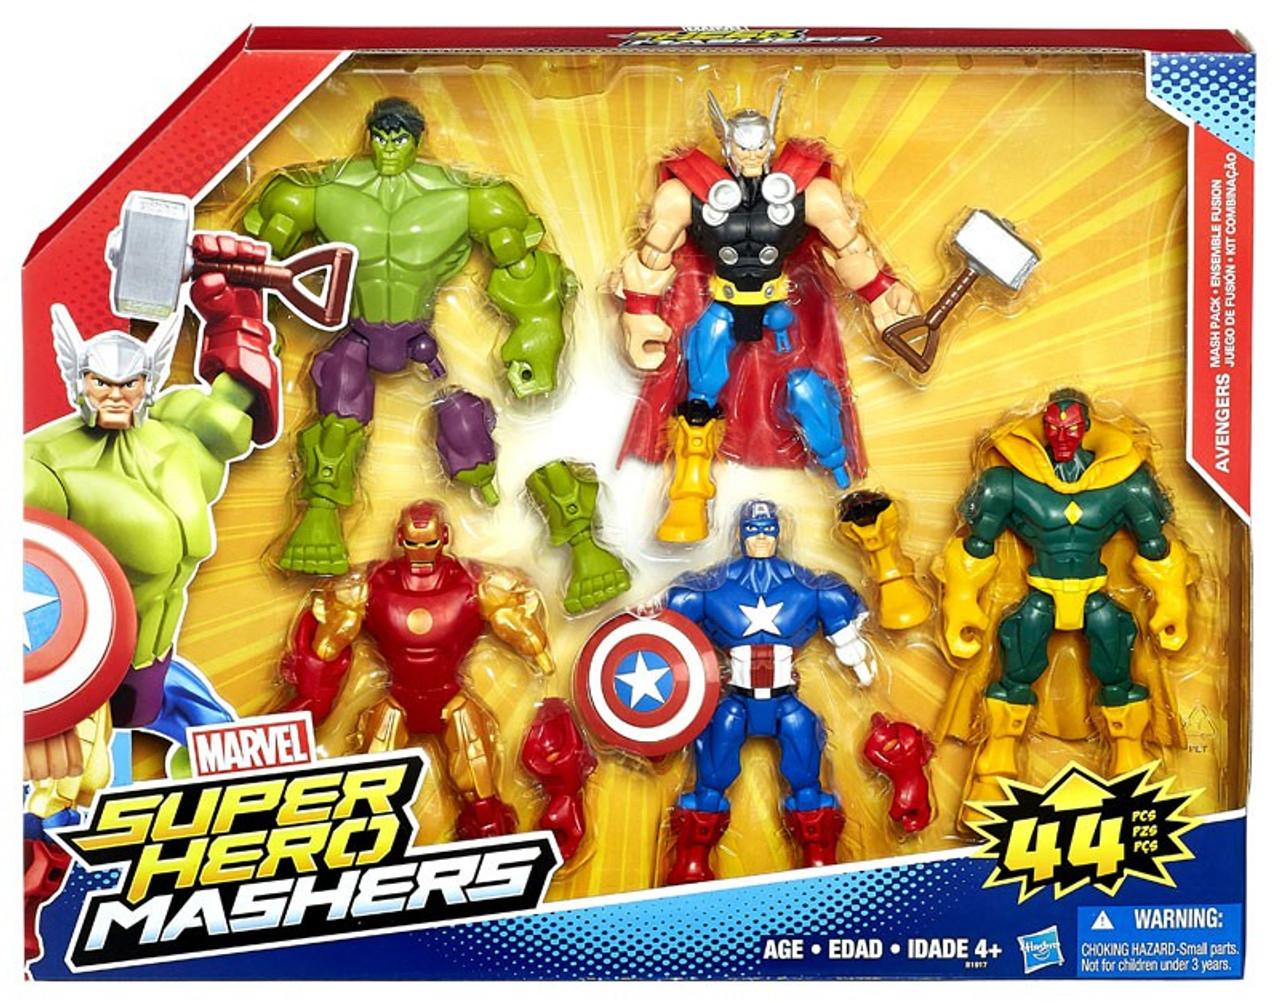 marvel super hero mashers battle mash pack captain america iron man hulk thor vision 6 action. Black Bedroom Furniture Sets. Home Design Ideas